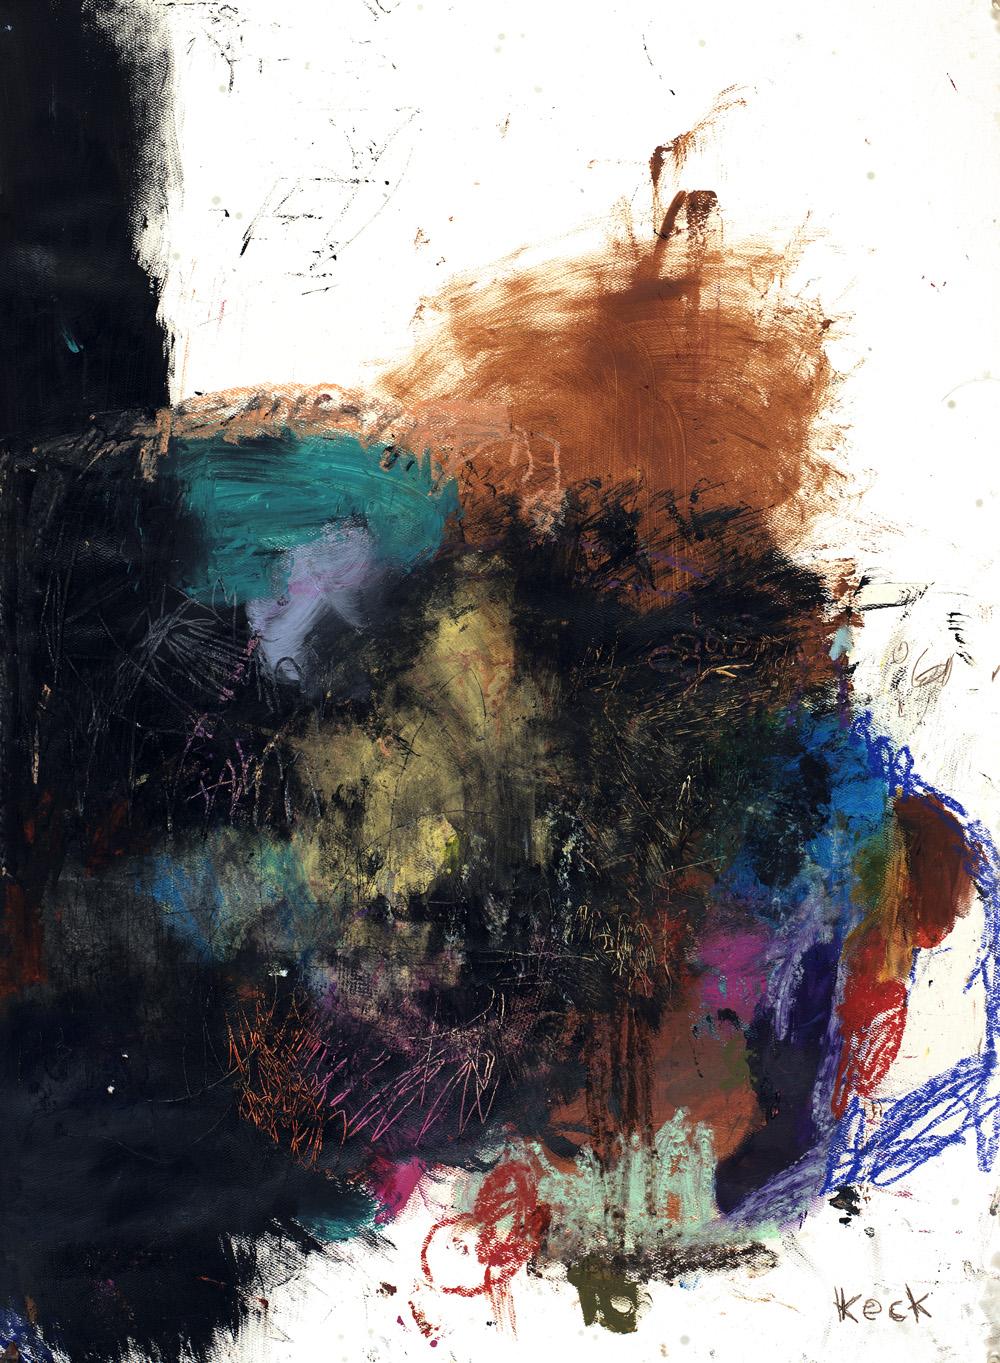 abstract art, abstract art prints, abstract canvas art print, abstract art print on canvas abstract art print on paper, abstract art michel keck